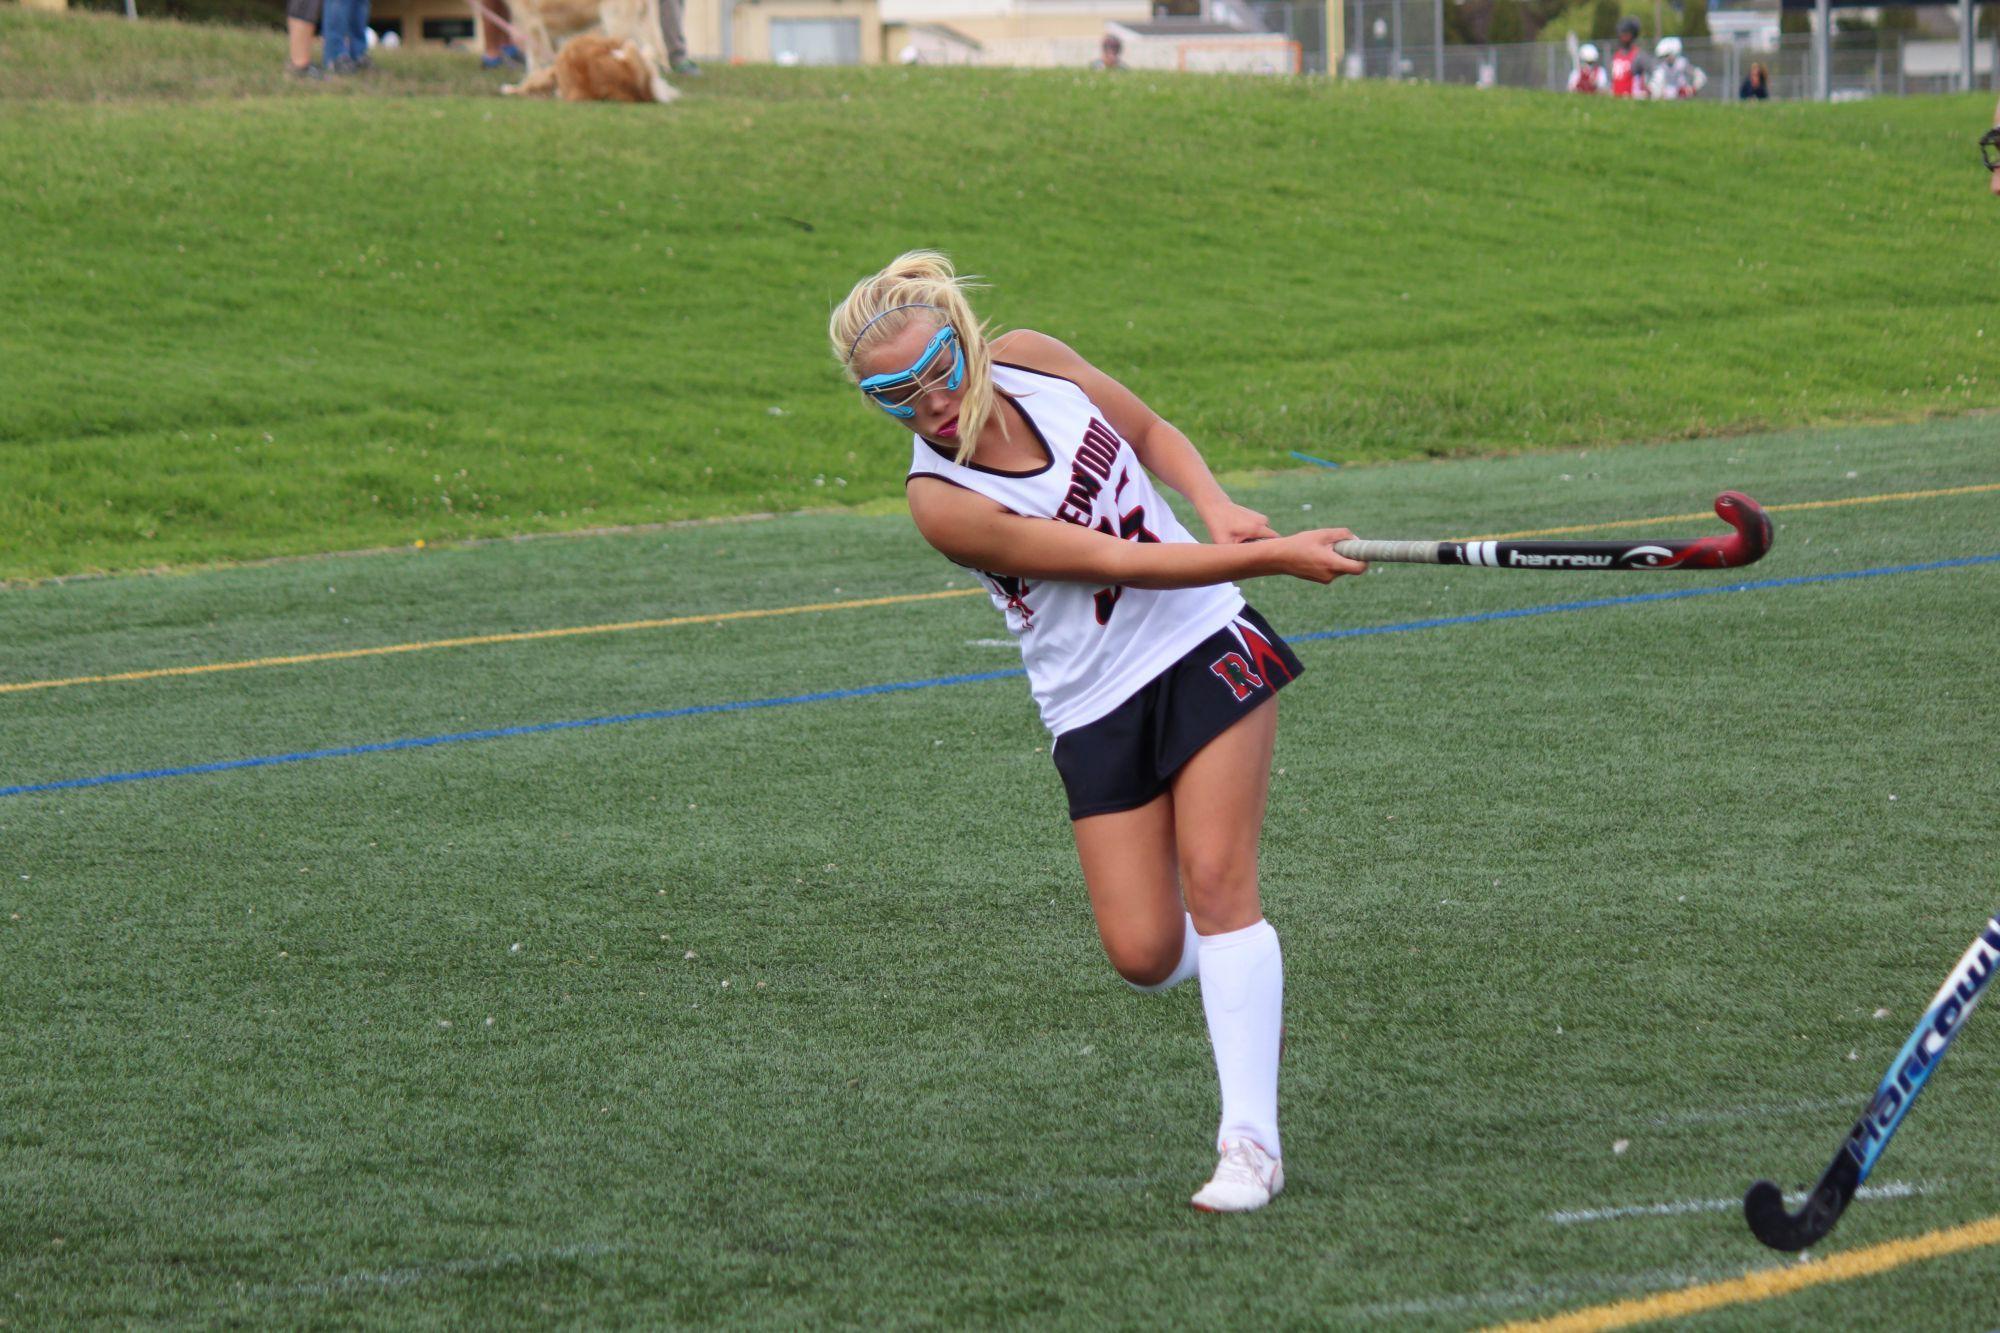 Girls' varsity field hockey soars past Drake in 9-0 shutout